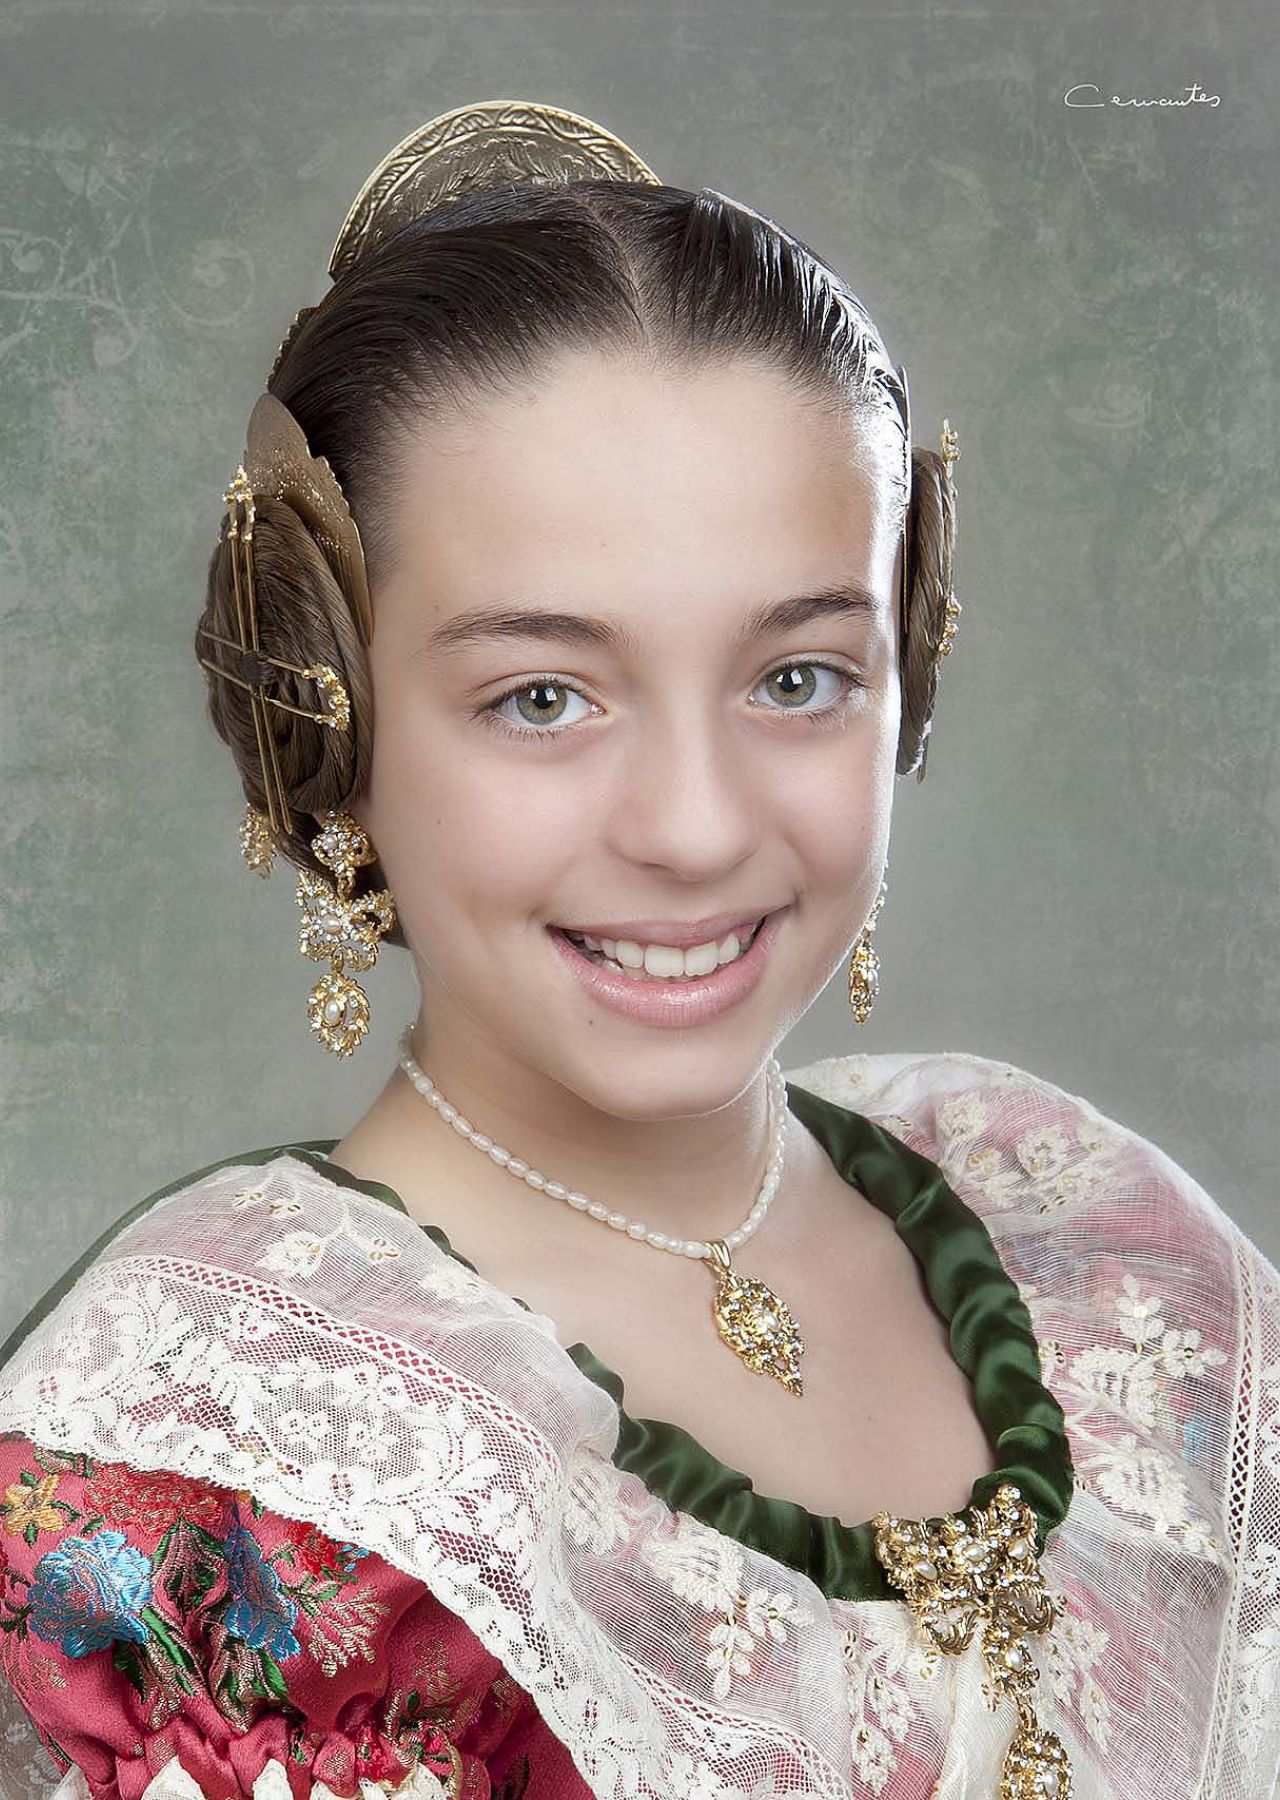 Lucía Gómez Jiménez